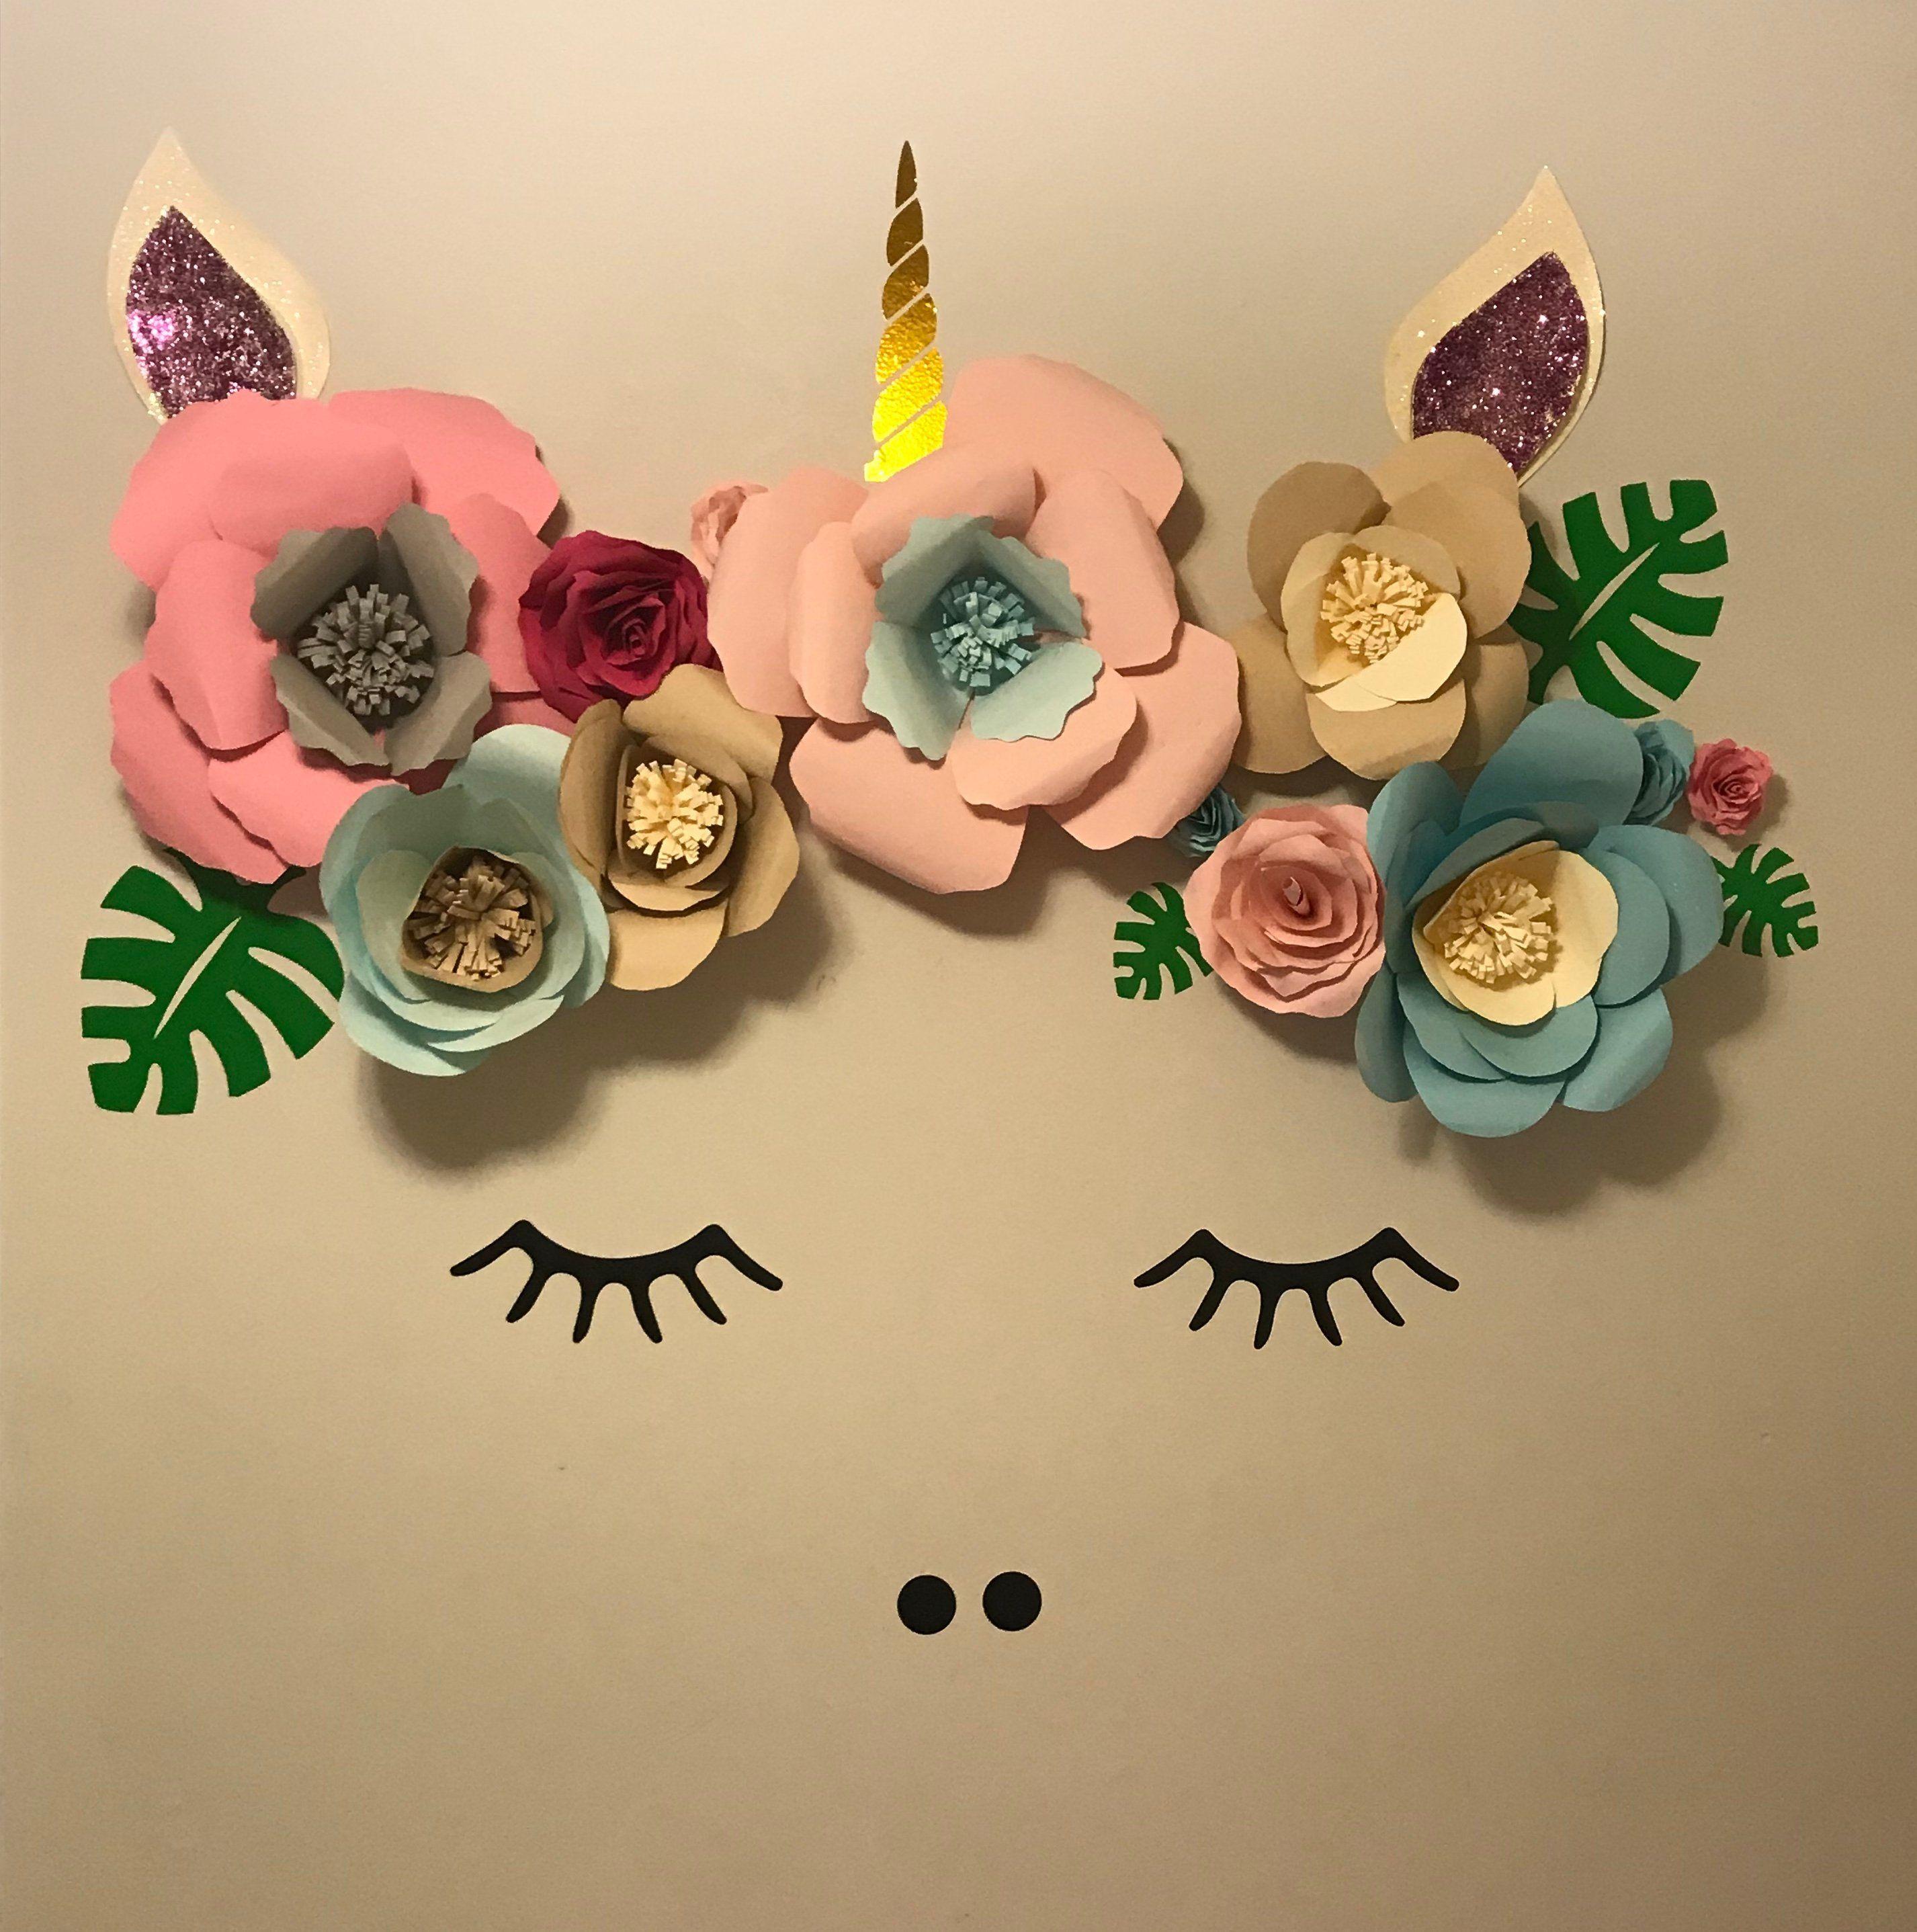 Unicorn Wall Decoration | Pinterest | Unicorn face, Horn and Unicorns